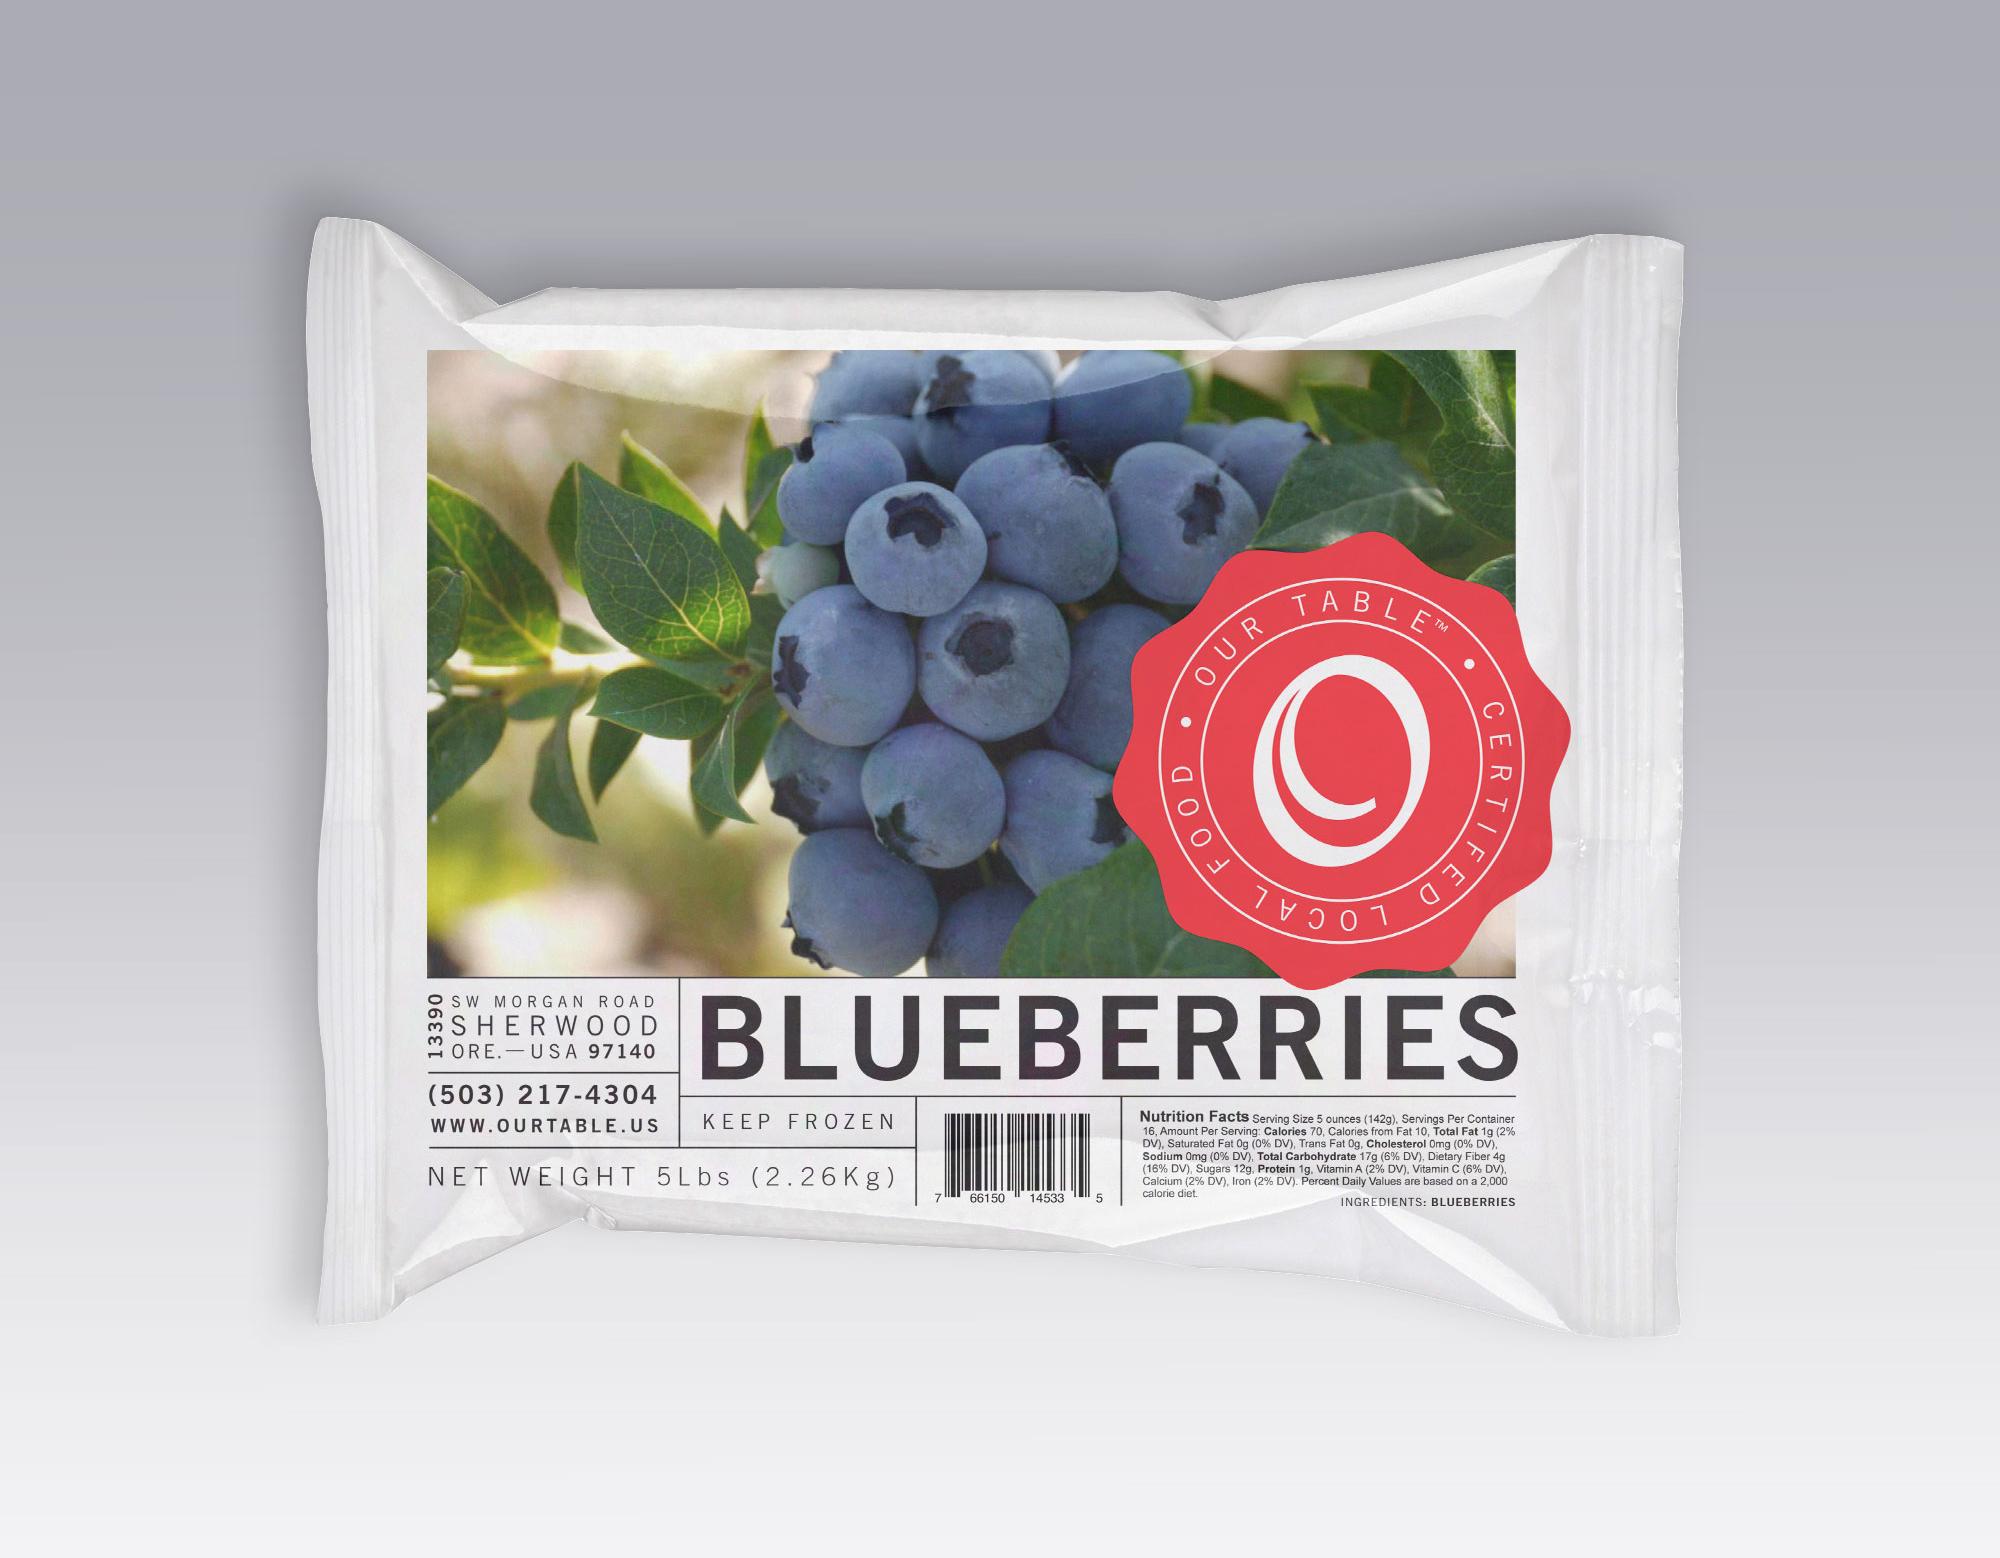 frozen blueberry package